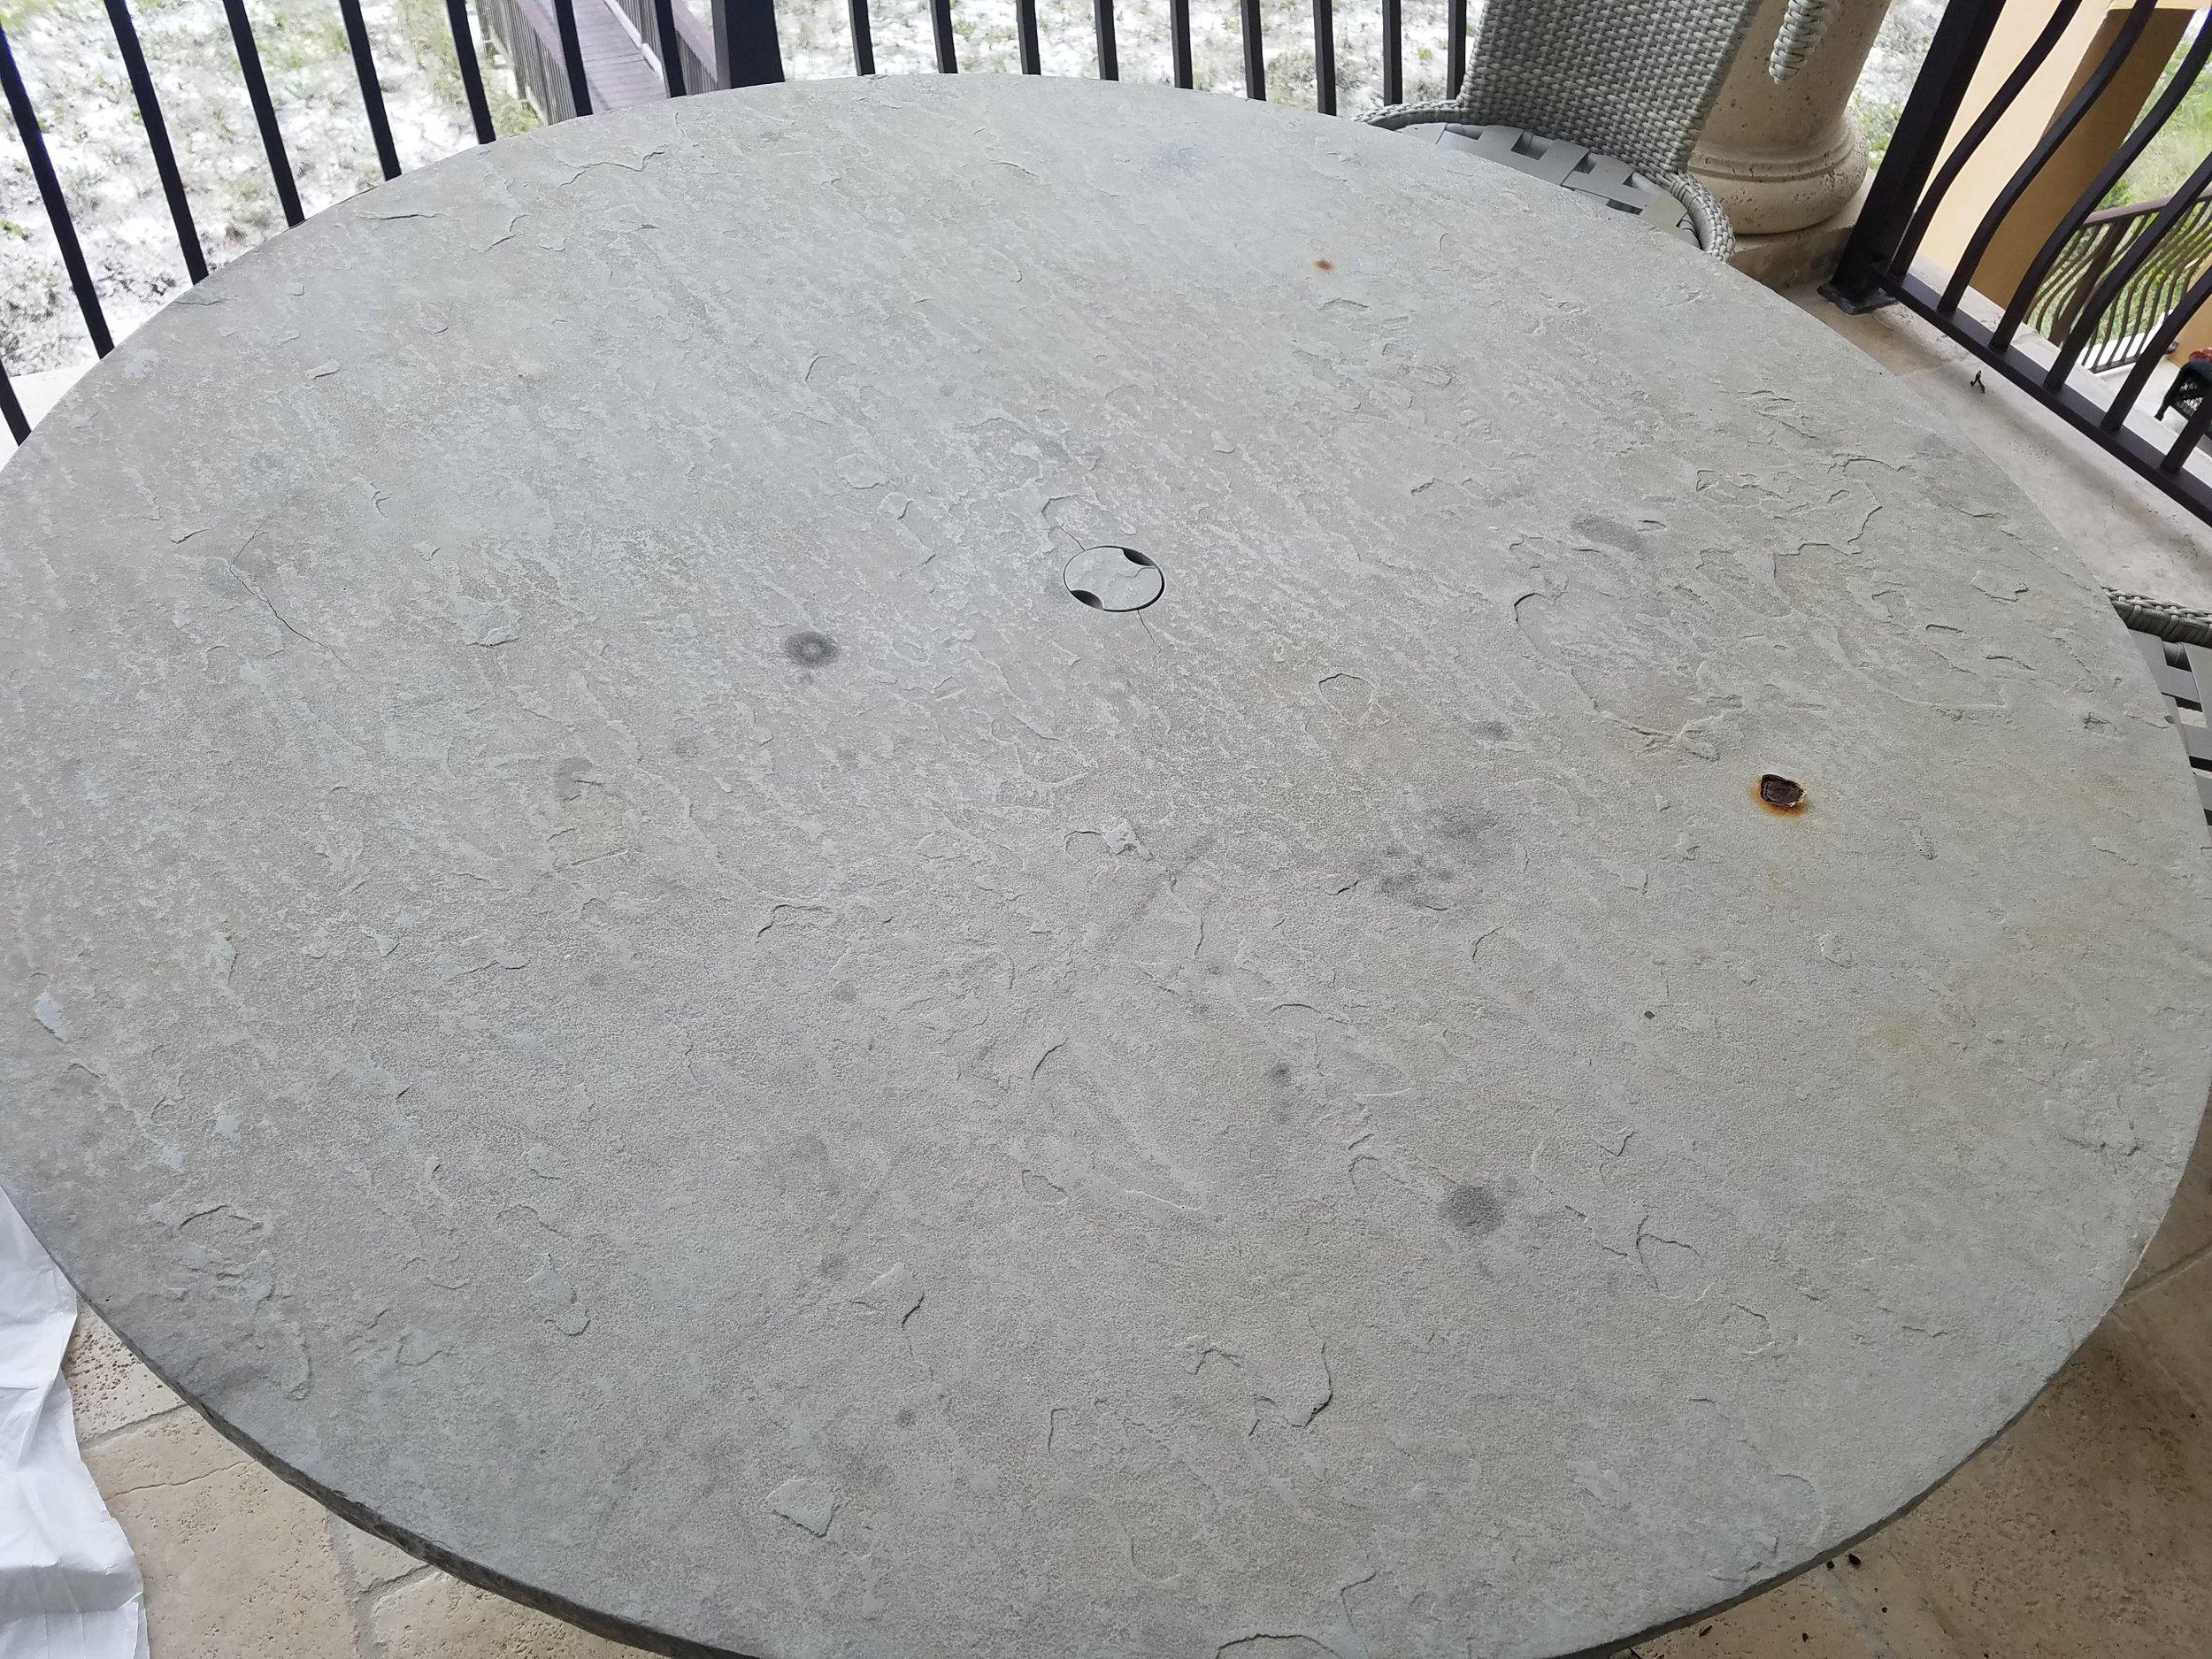 Balcony table before.jpg